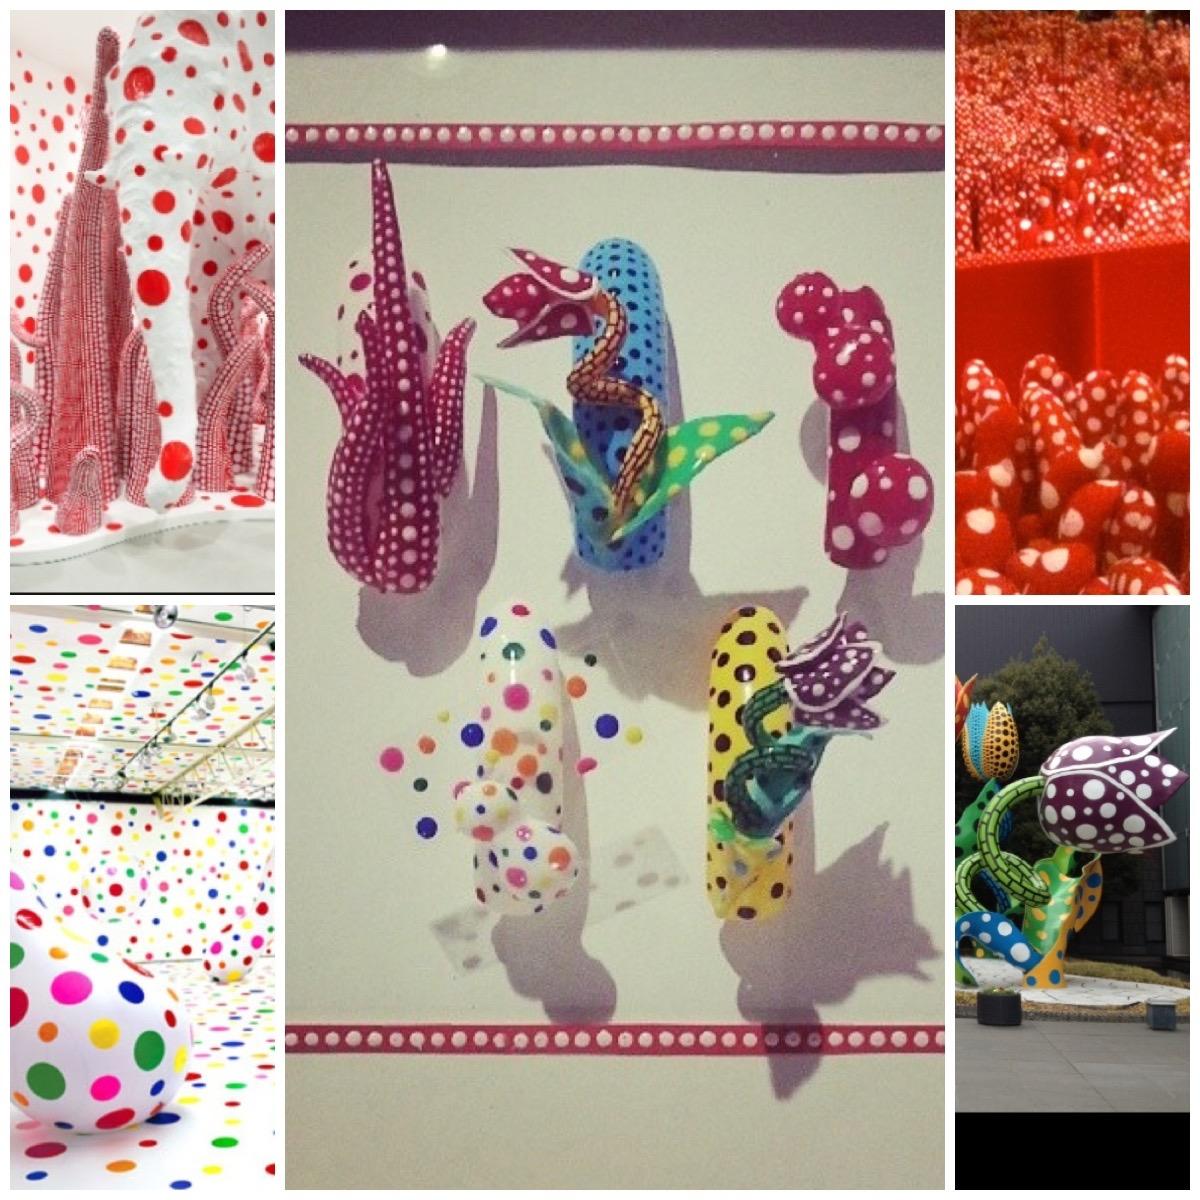 Kimi's creation inspired by renowned Japanese artist, Yayoi Kusama